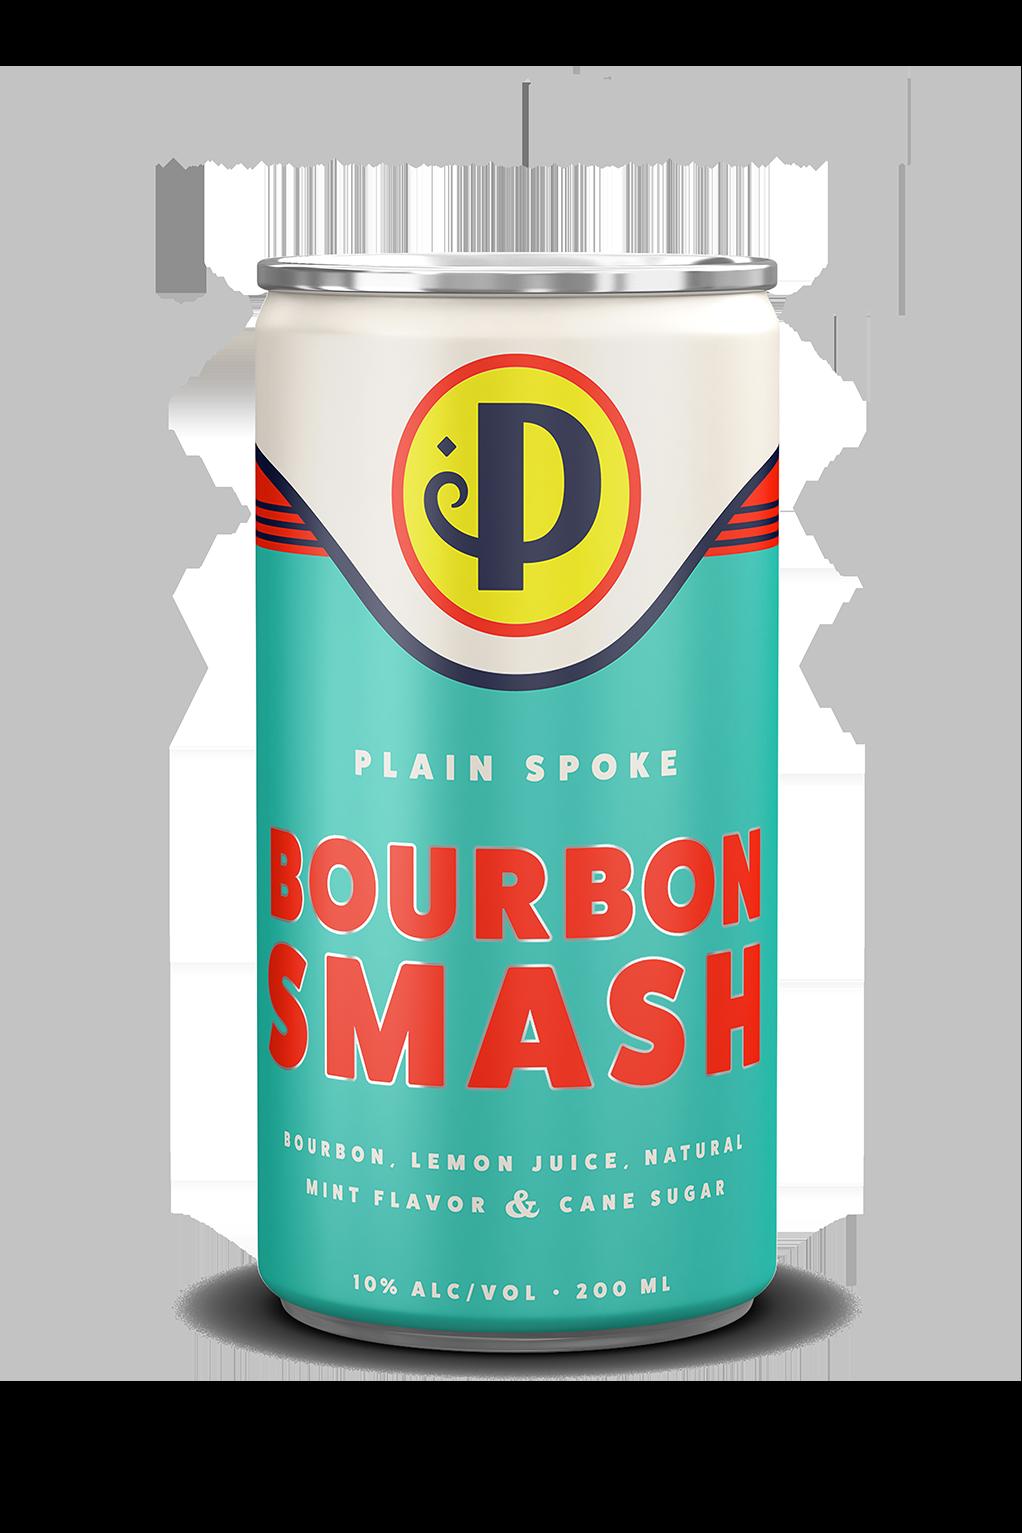 bourbon_smash_can_min